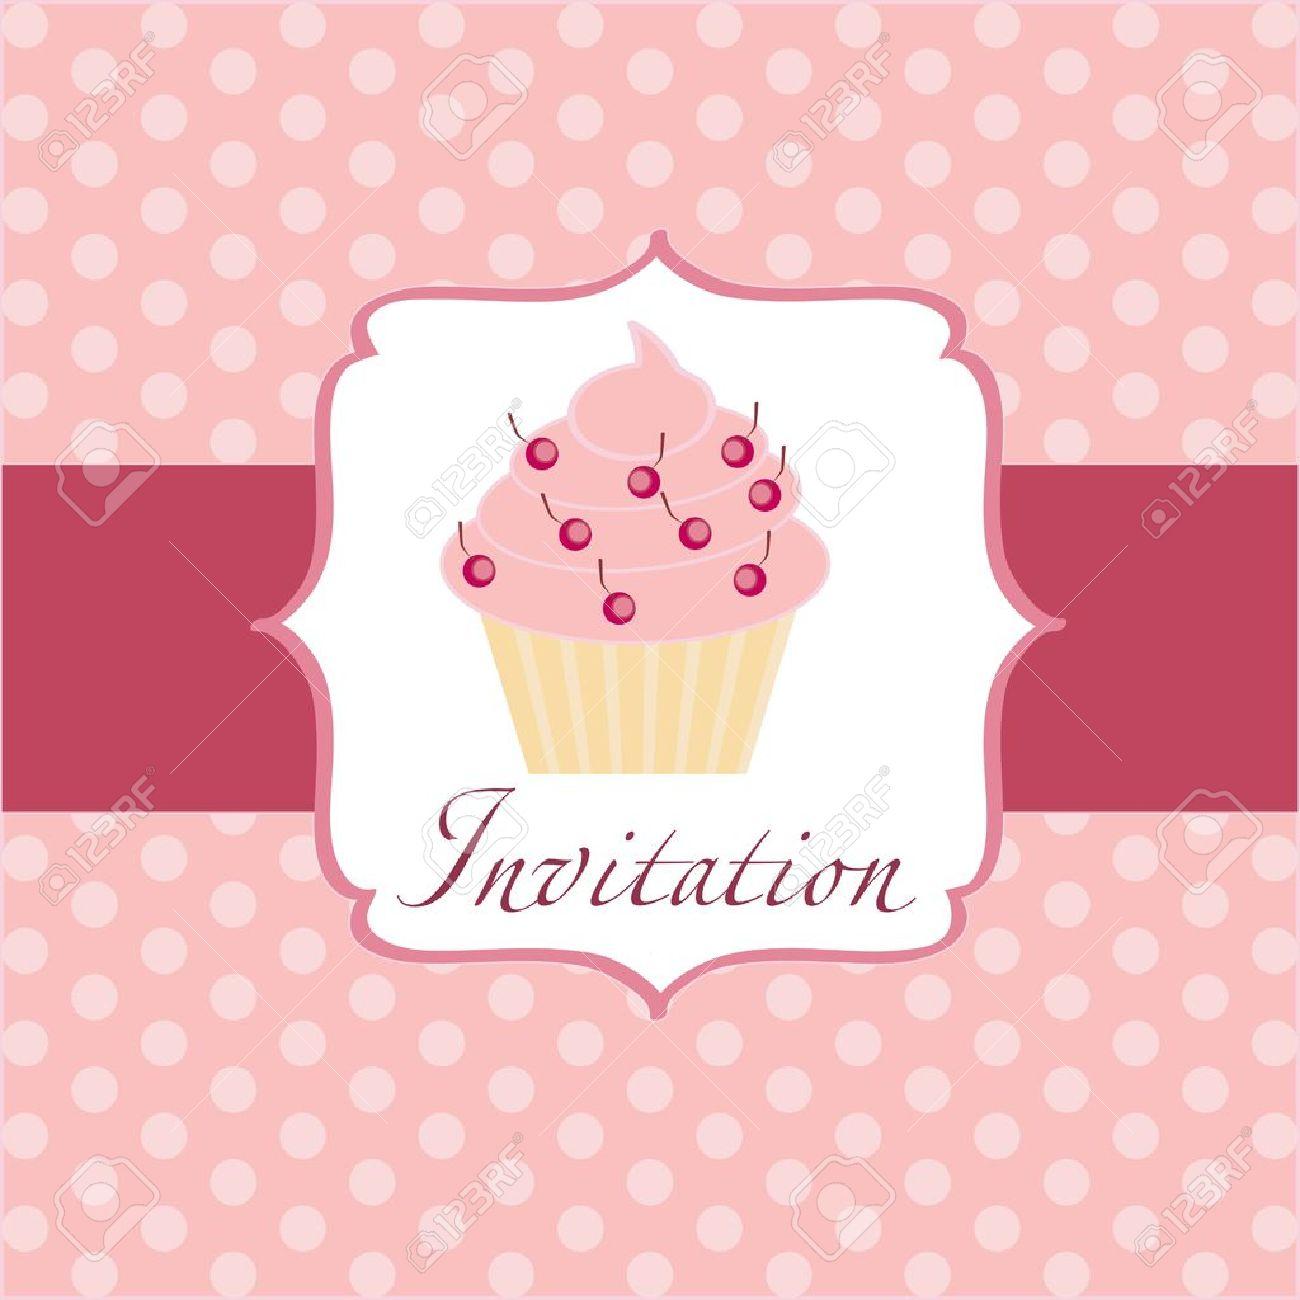 cupcake invitation background Stock Vector - 11368286